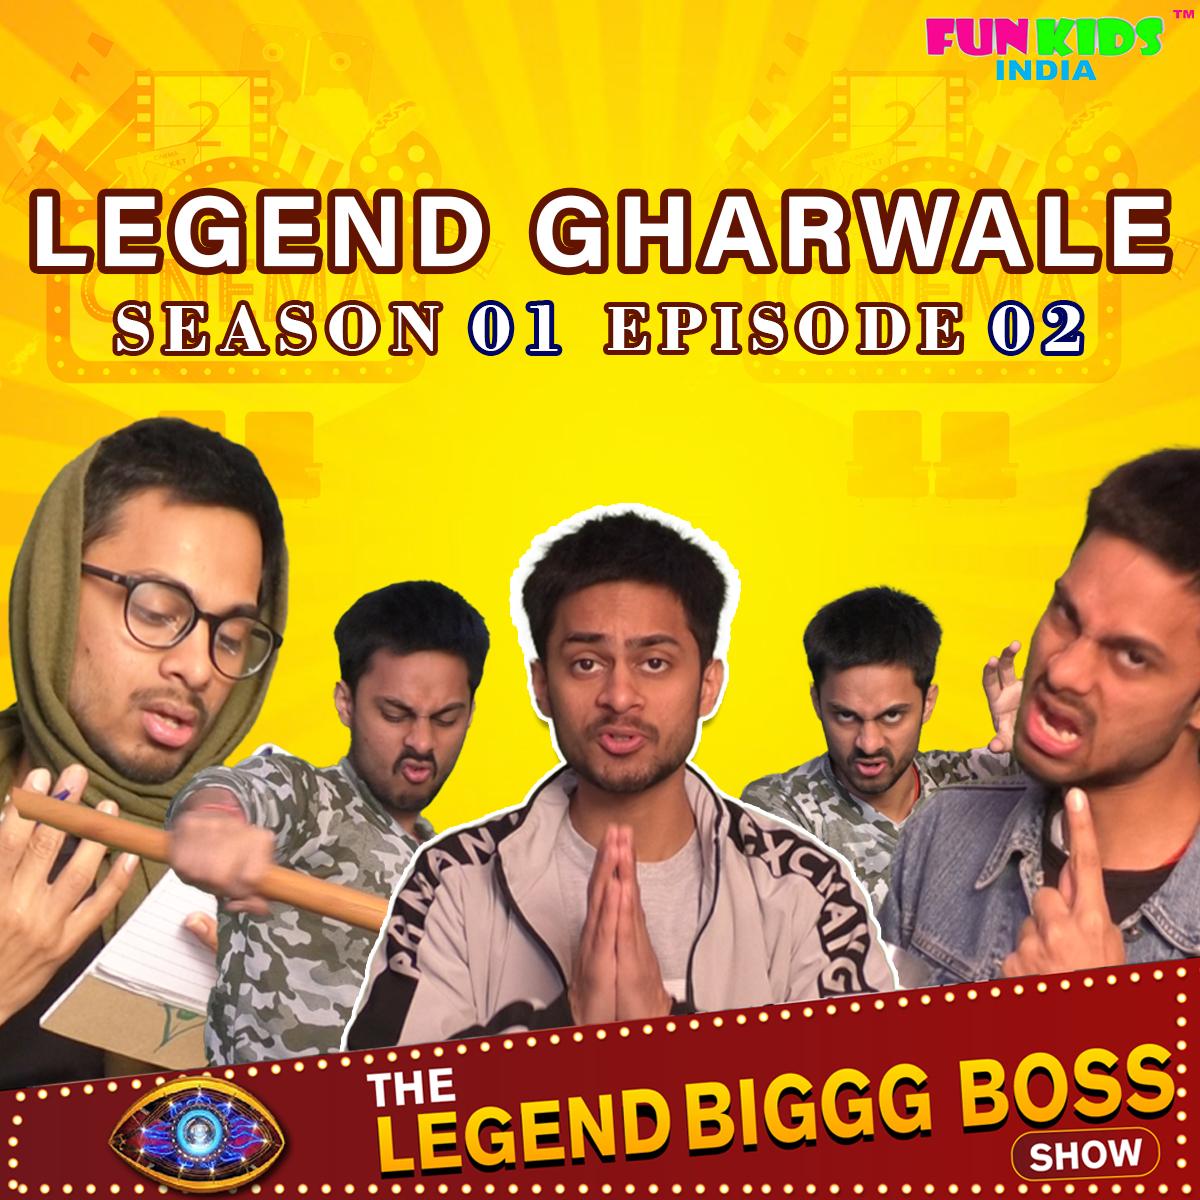 bigg boss season 1 ep. 2